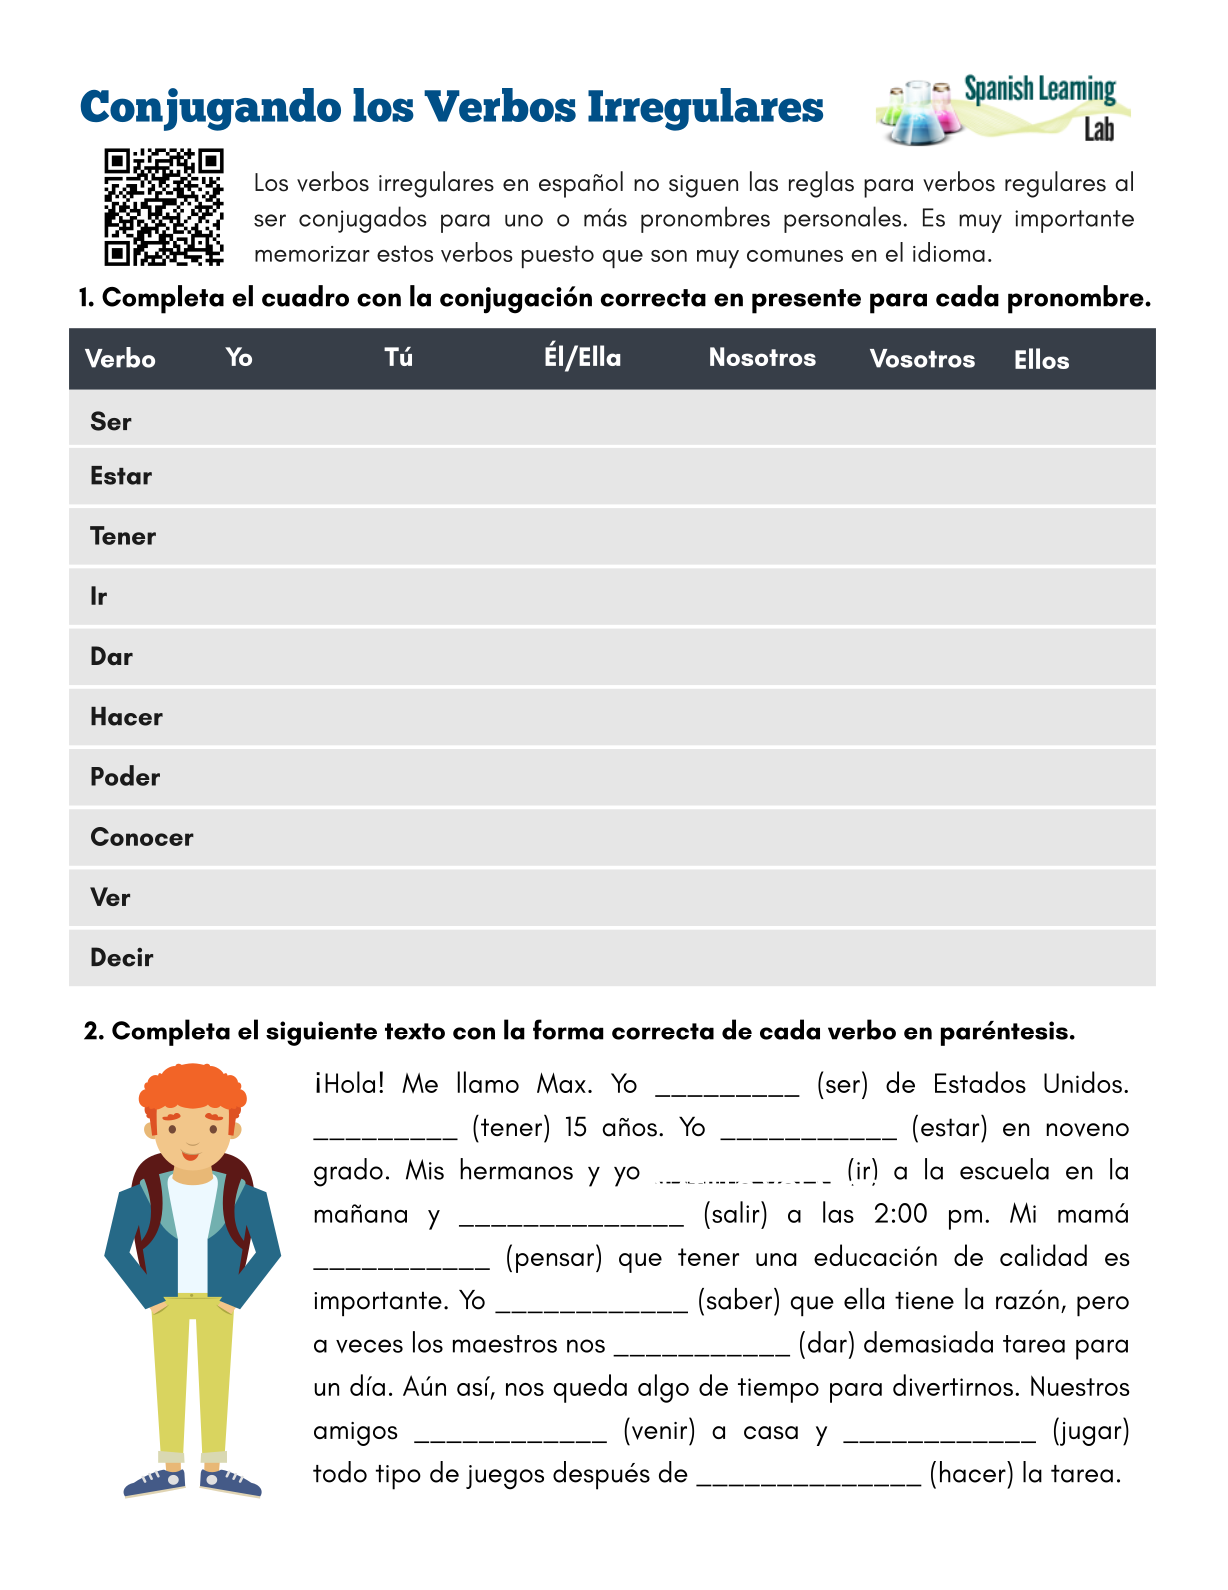 Conjugating Irregular Verbs In Spanish